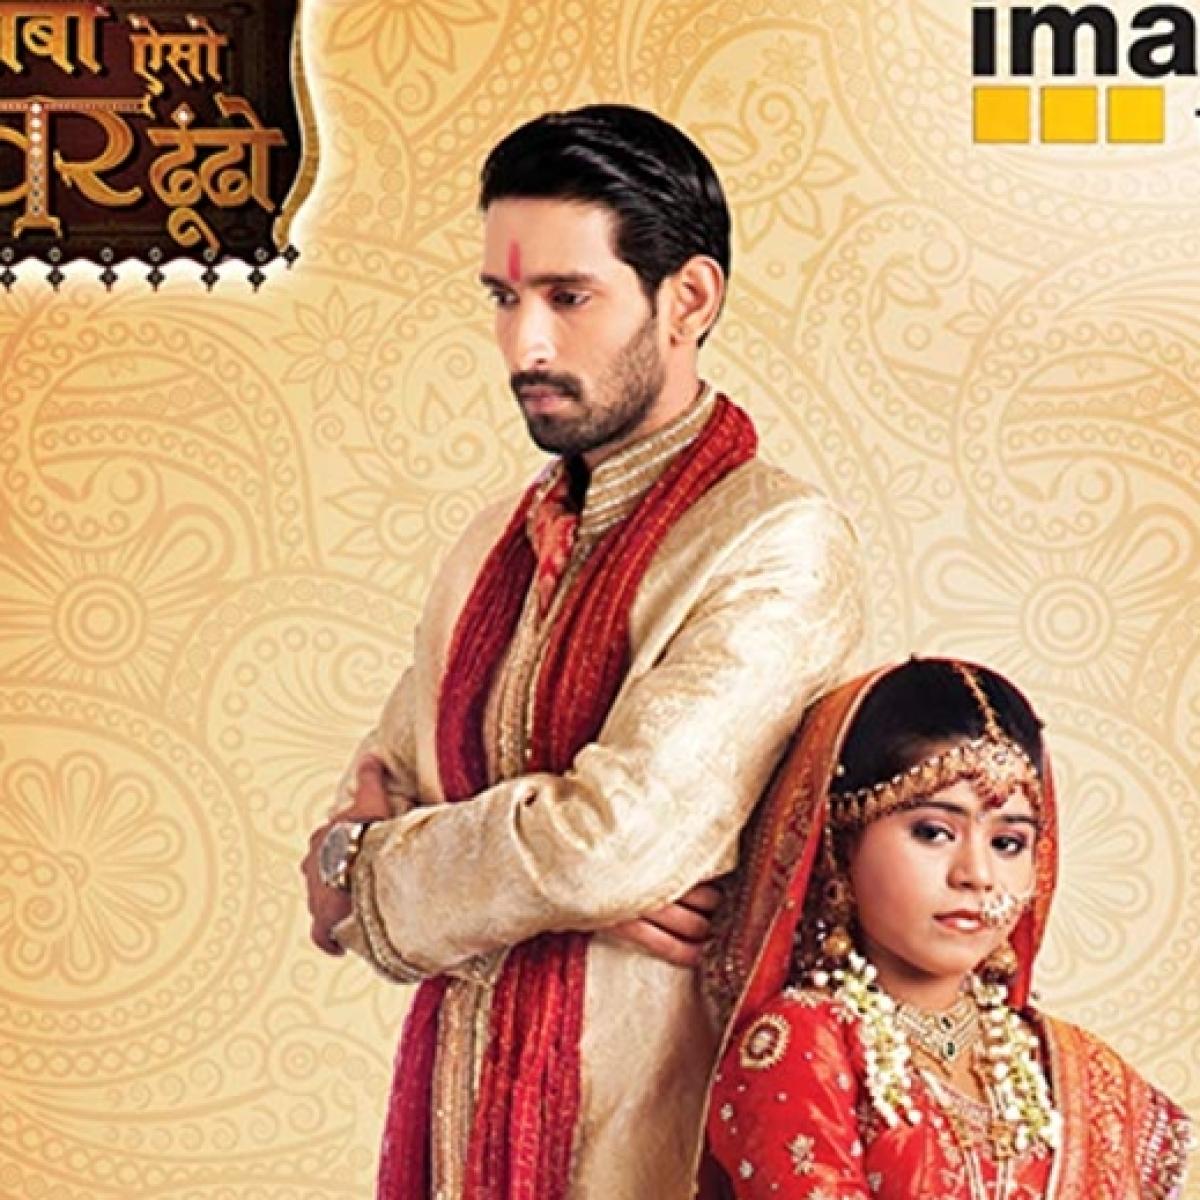 International Women's Day 2020: Indian TV shows still portray 'thinking' women as 'manipulative'